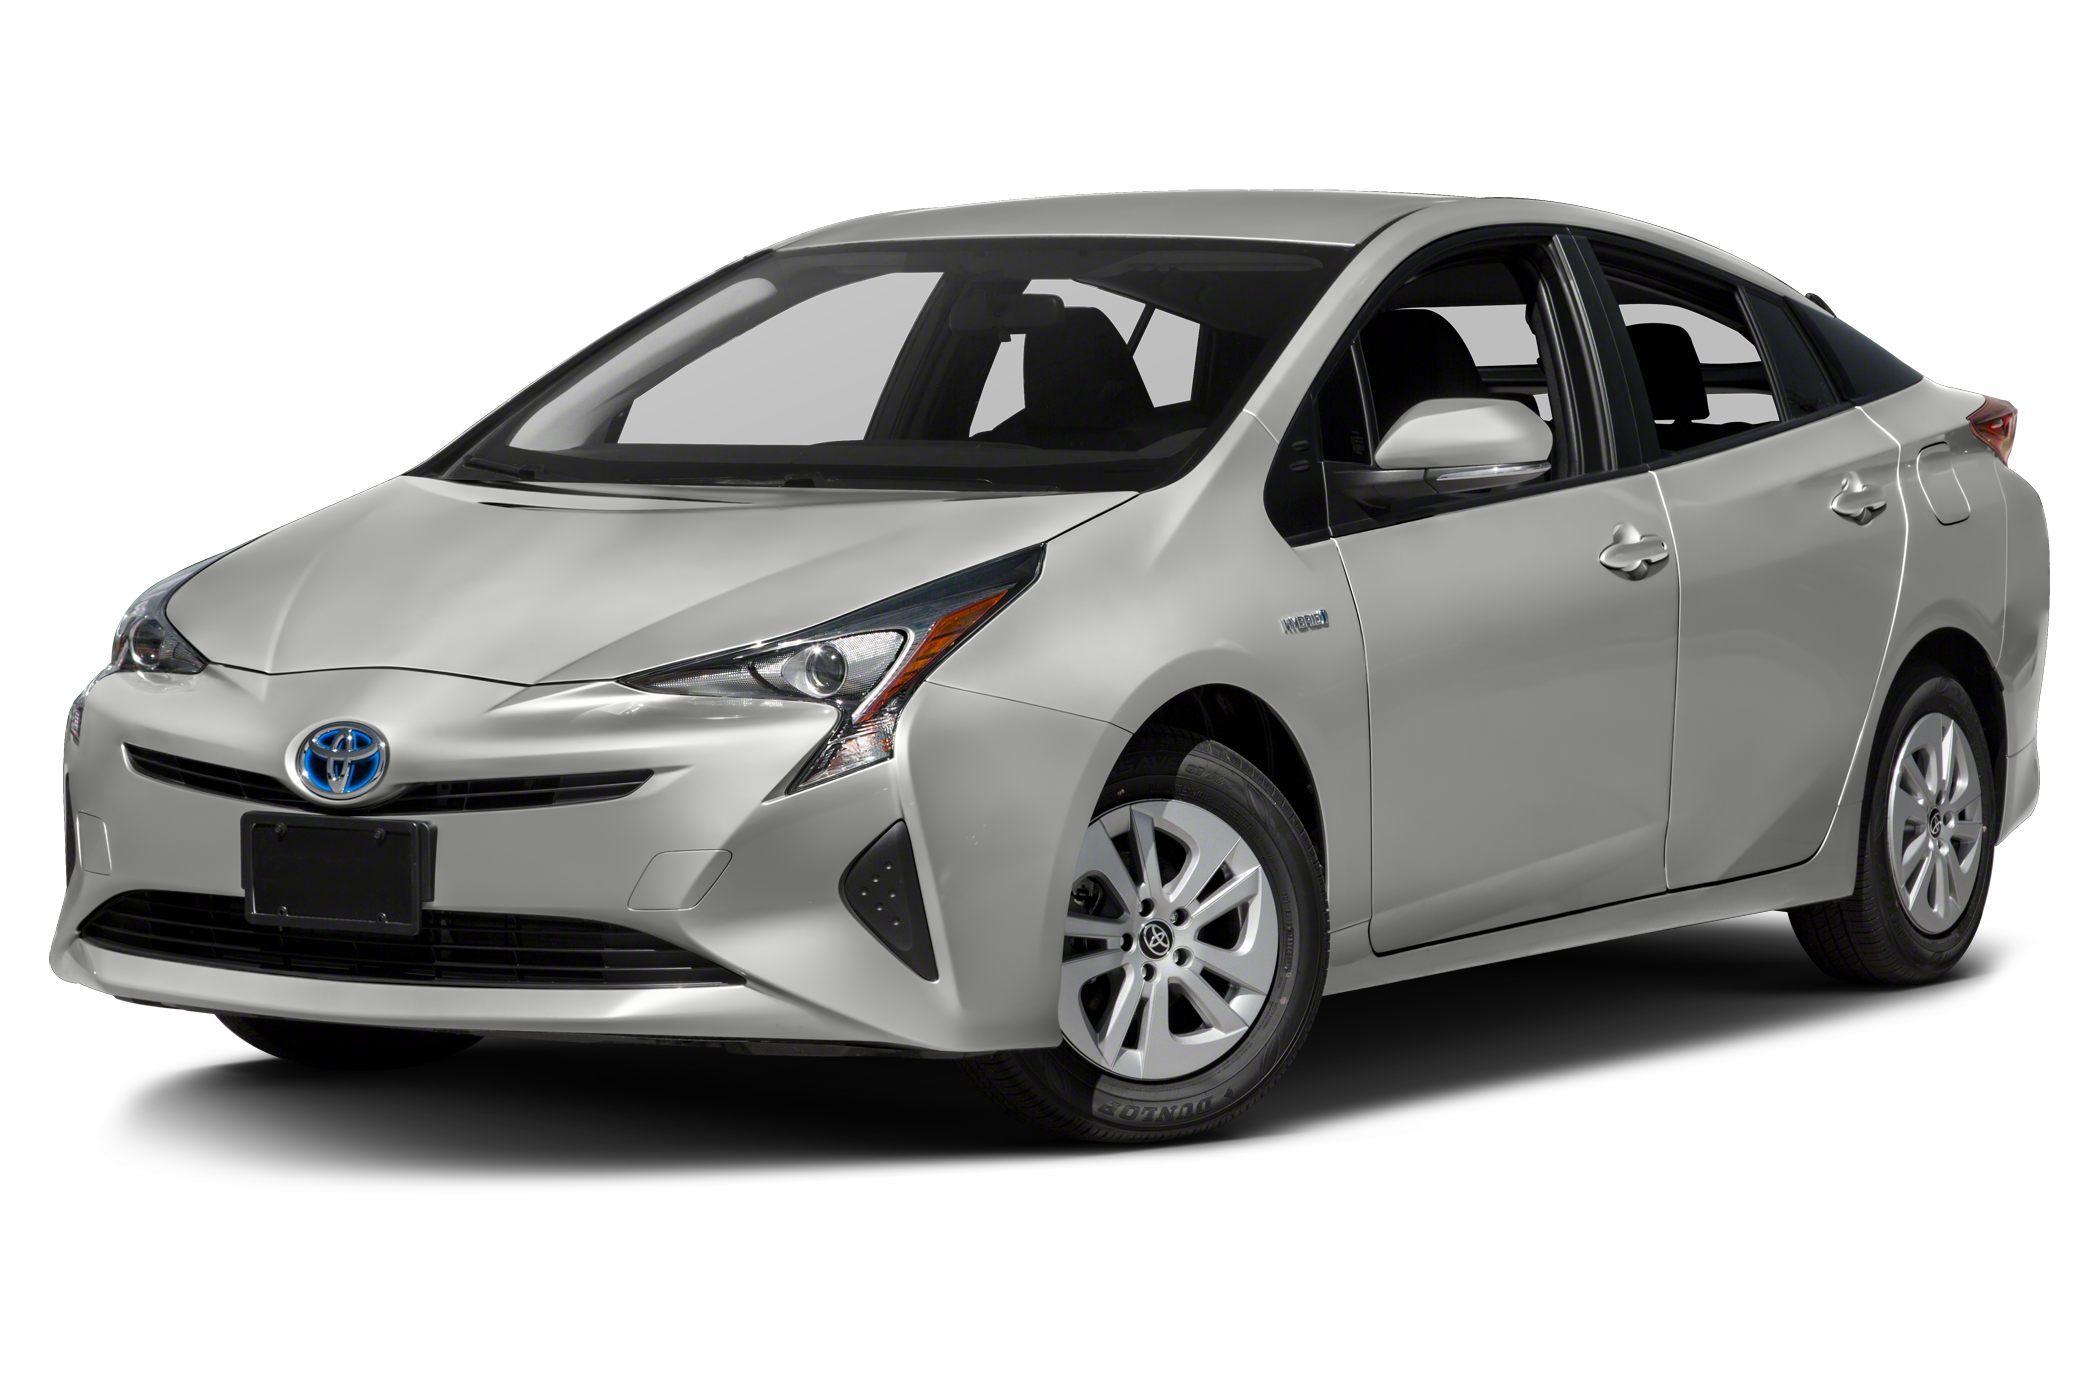 Toyota Hybrid Cars >> Toyota Recalls 340 000 Hybrid Cars Over Brakes Fault News